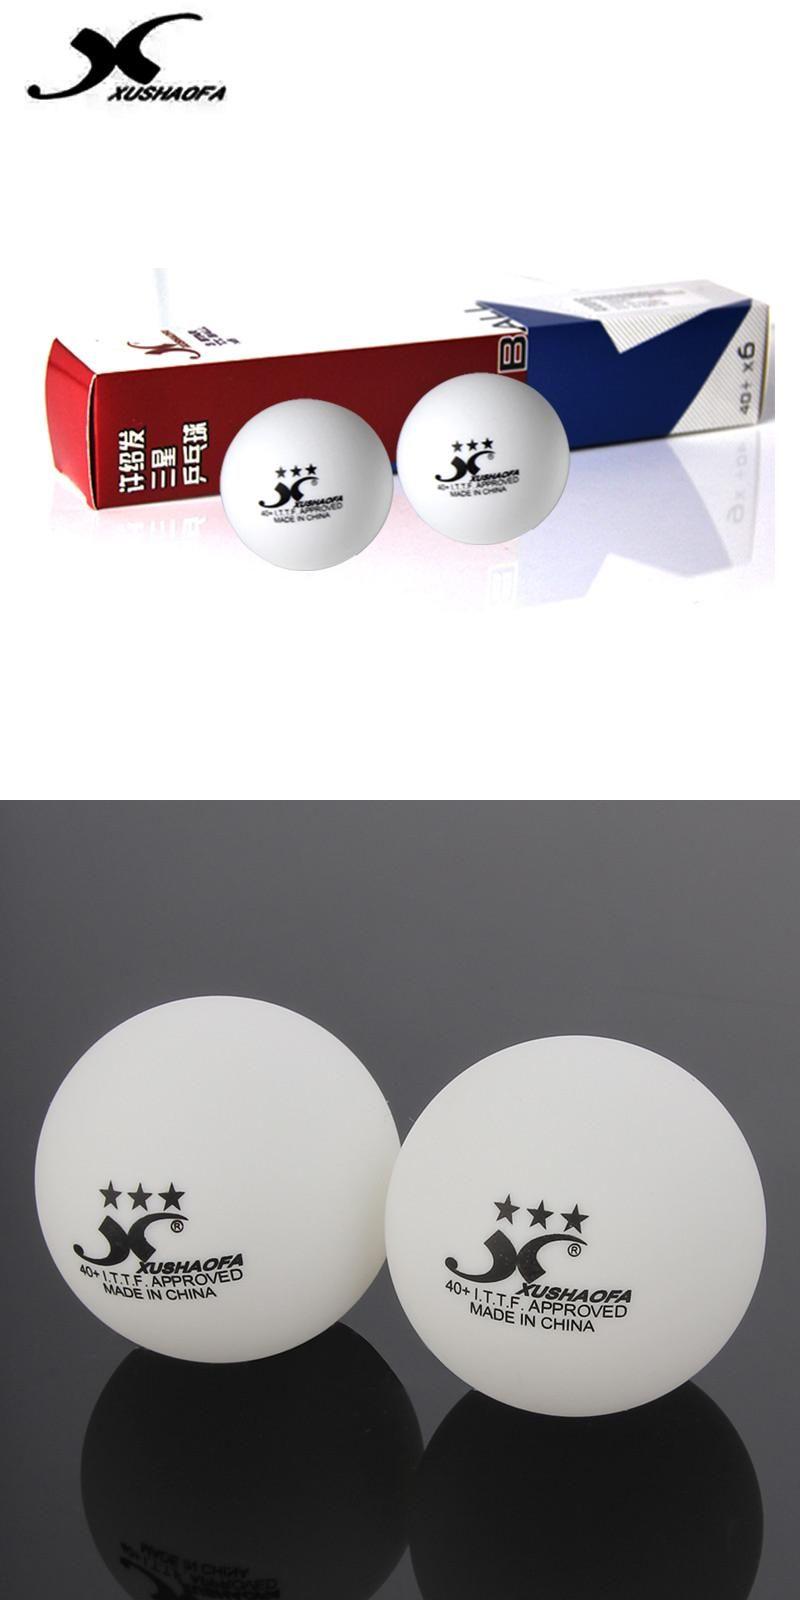 Visit To Buy Xushaofa 40 Poly 3 Star Table Tennis Balls Xsf Seamless New Material White Ping Pong Balls Ittf Appro Table Tennis Tennis Balls Ping Pong Balls